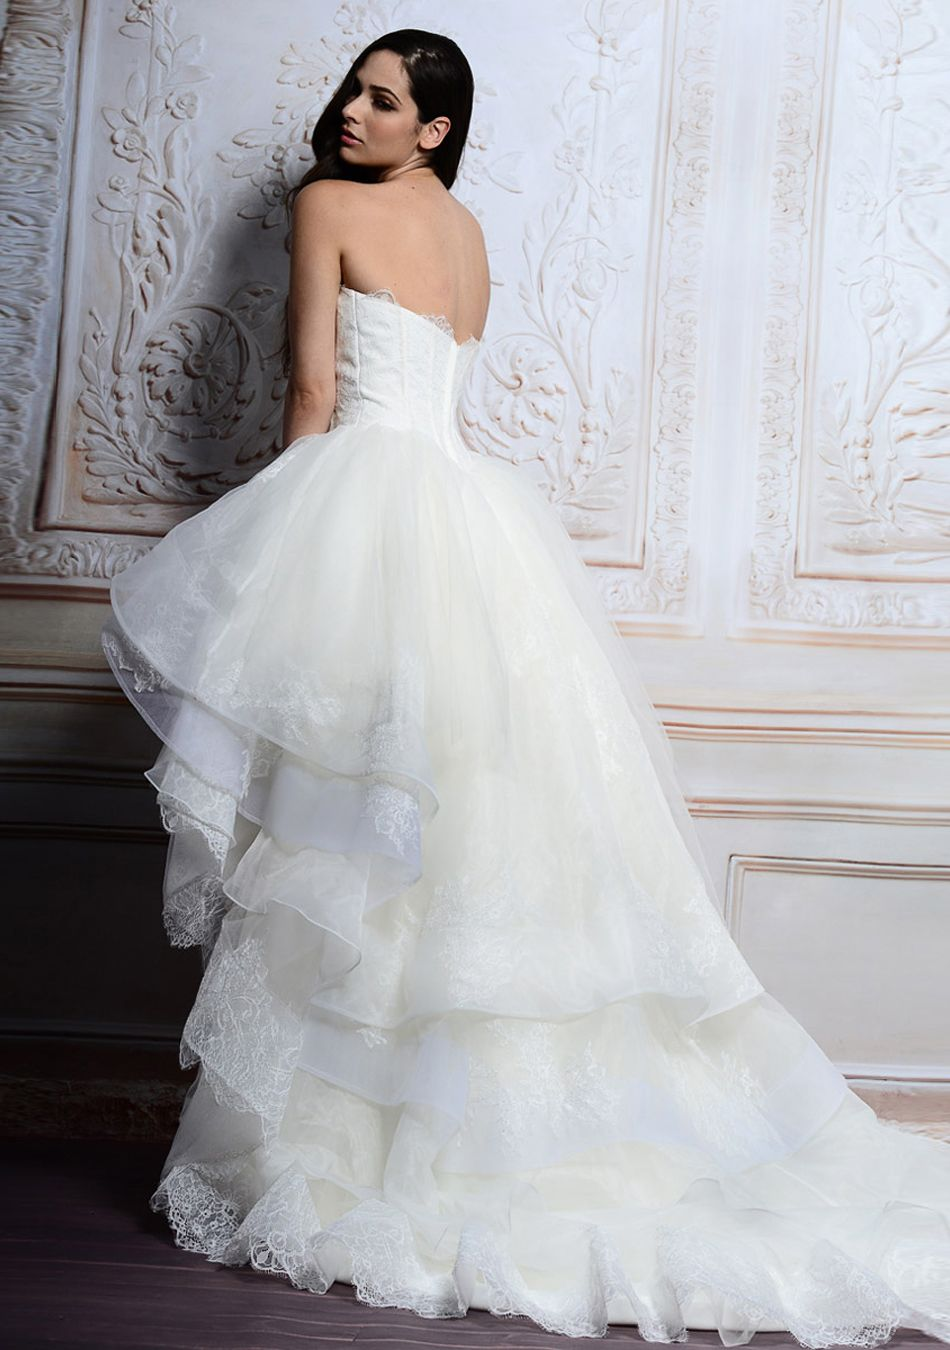 open back wedding dresses Fantastic Morden Short White Lace Ball Gown Wedding